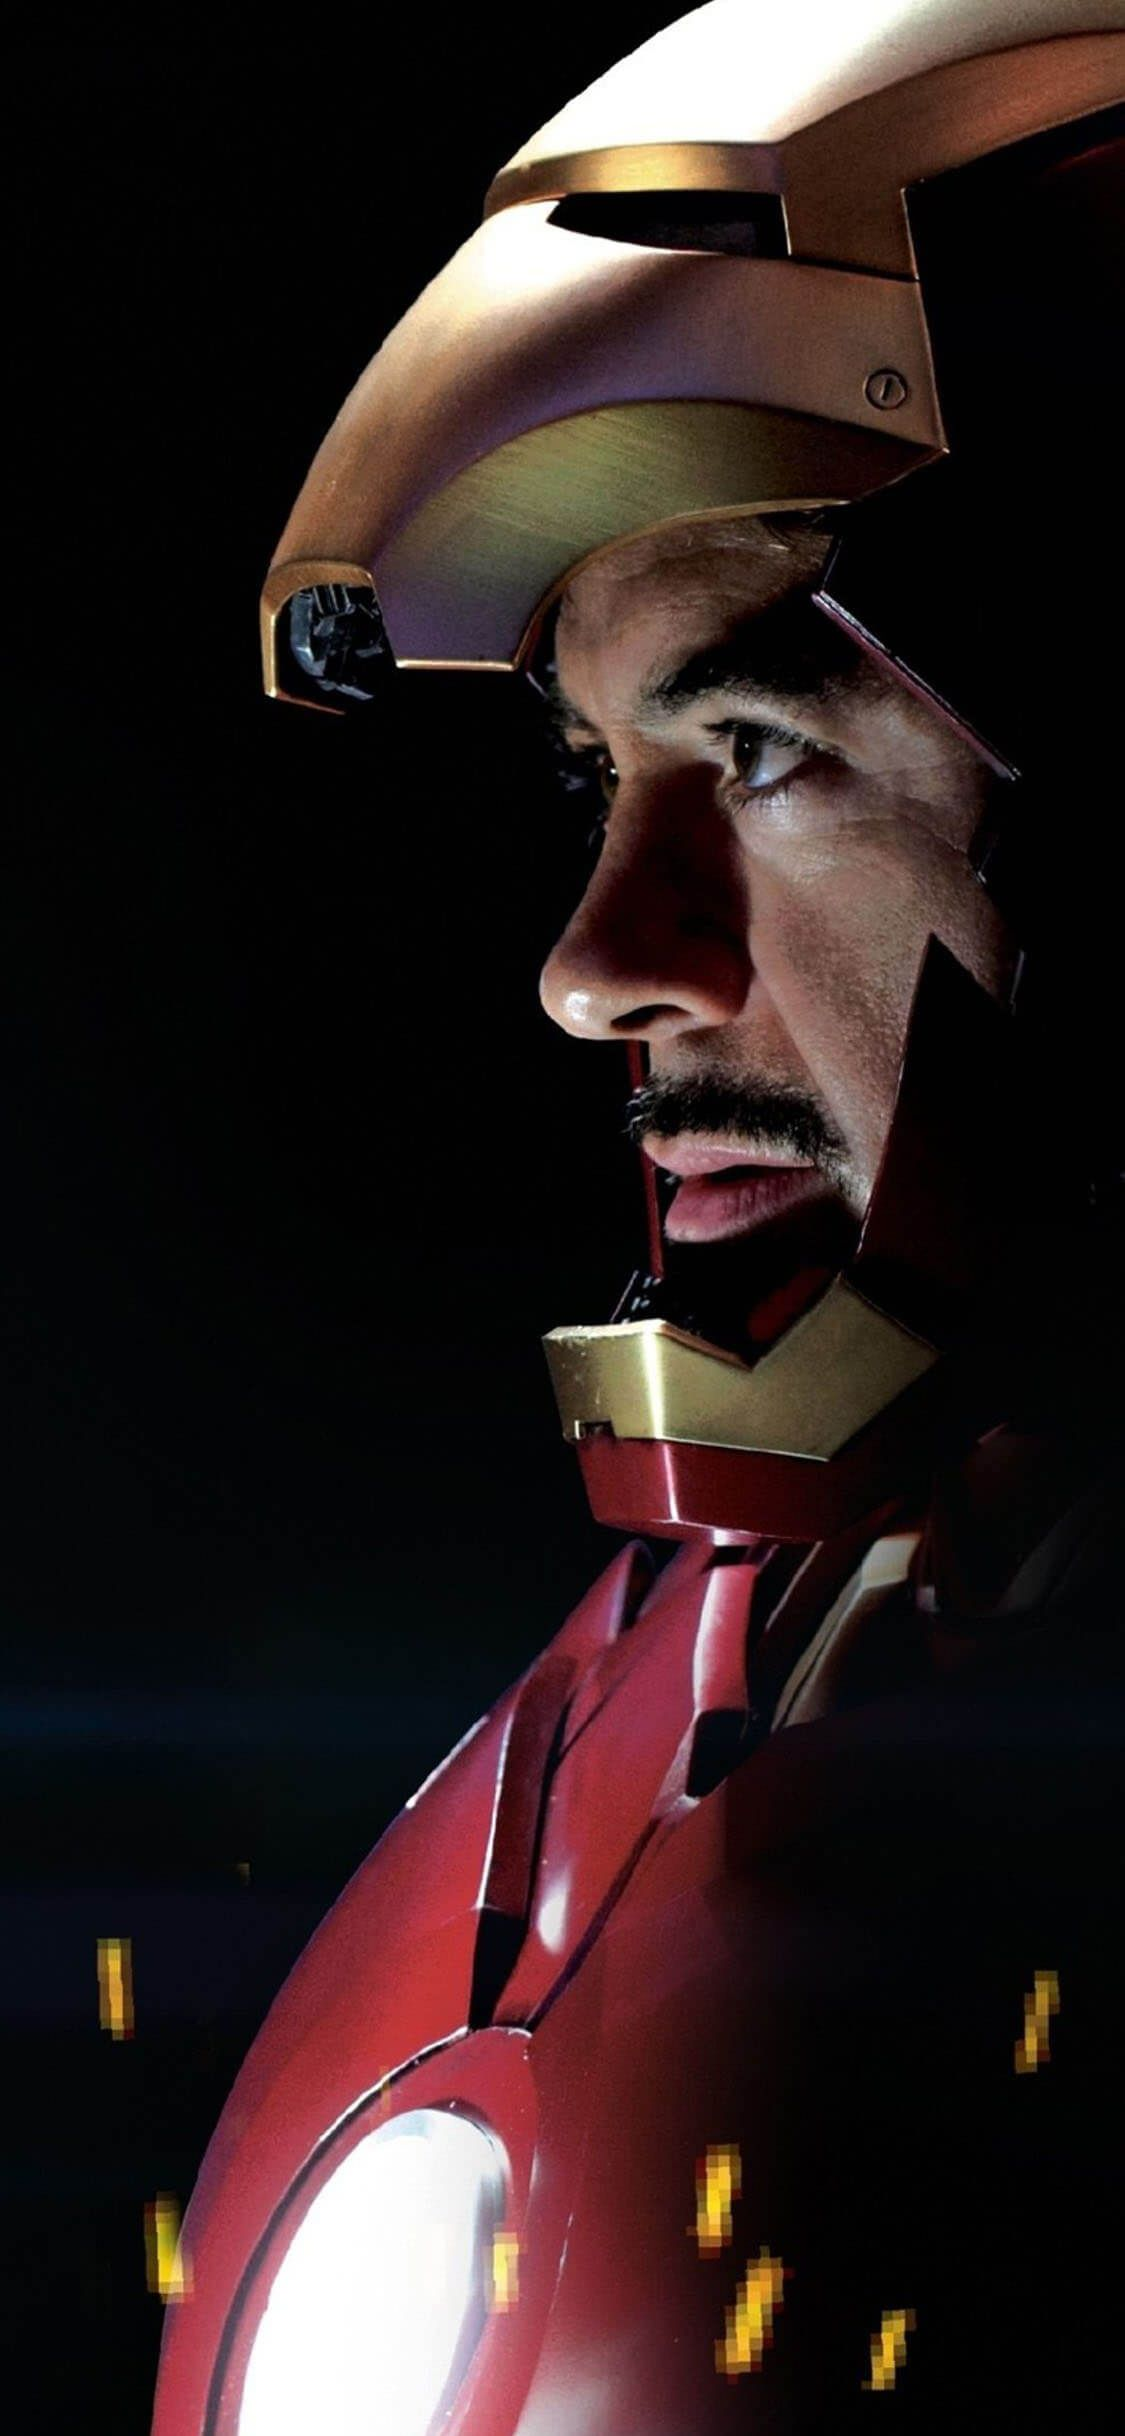 35+ Best Iron Man Iphone Wallpapers 2019 Iron man, Best